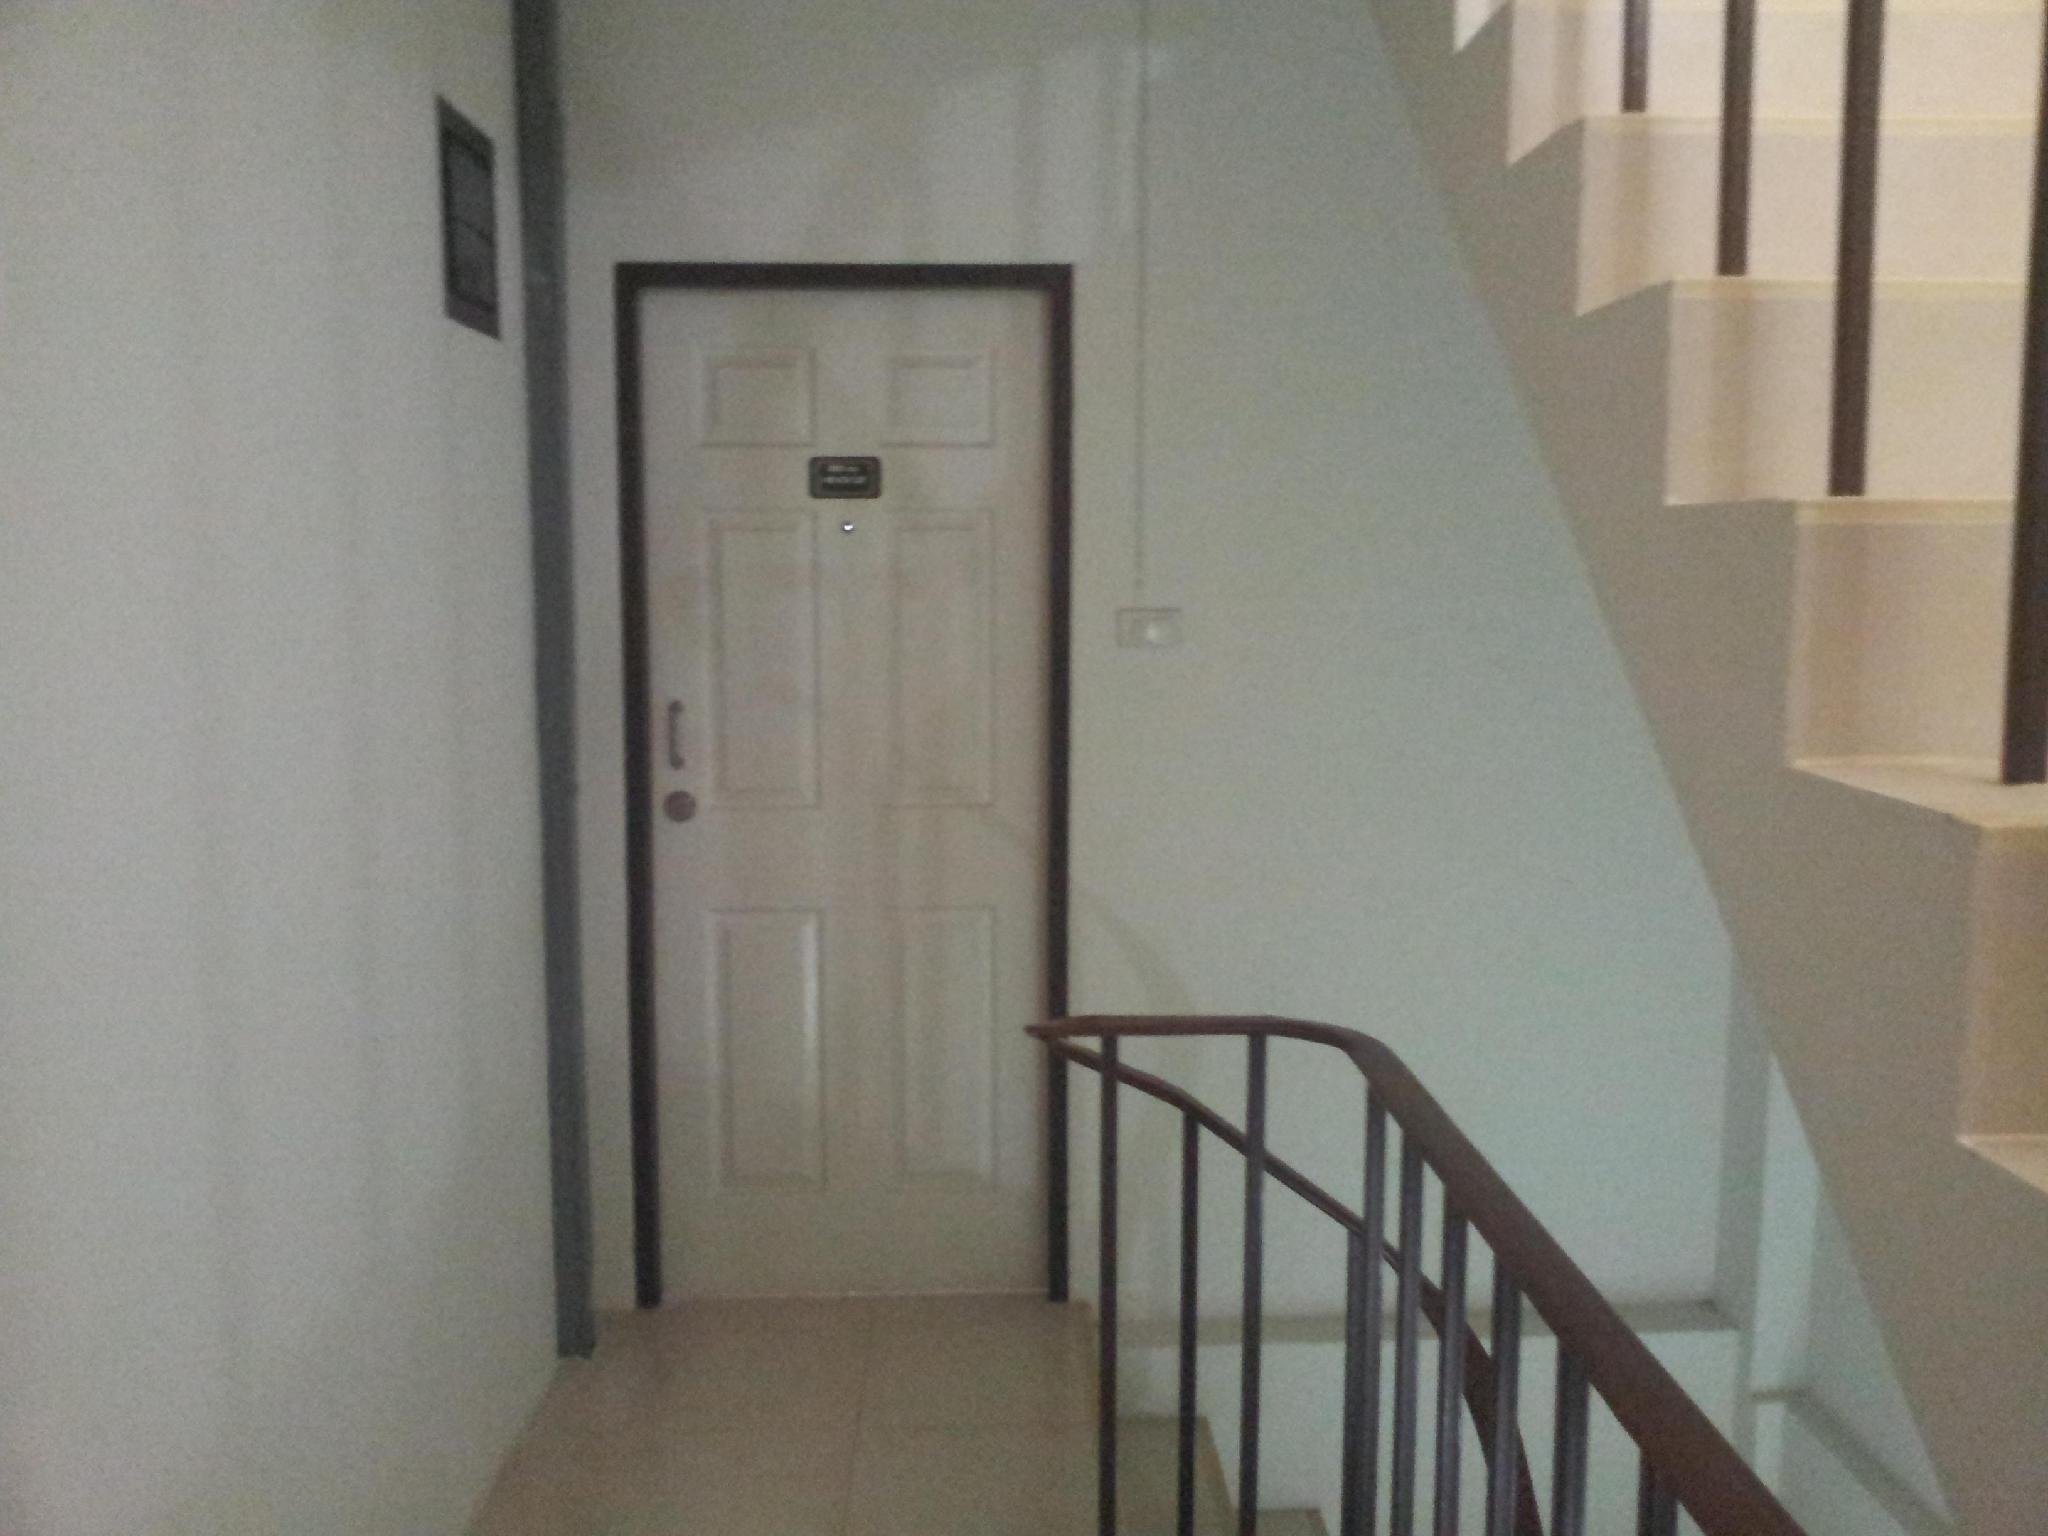 Bangsean Room Female Dormitory,หอพักหญิง บางแสนรูม